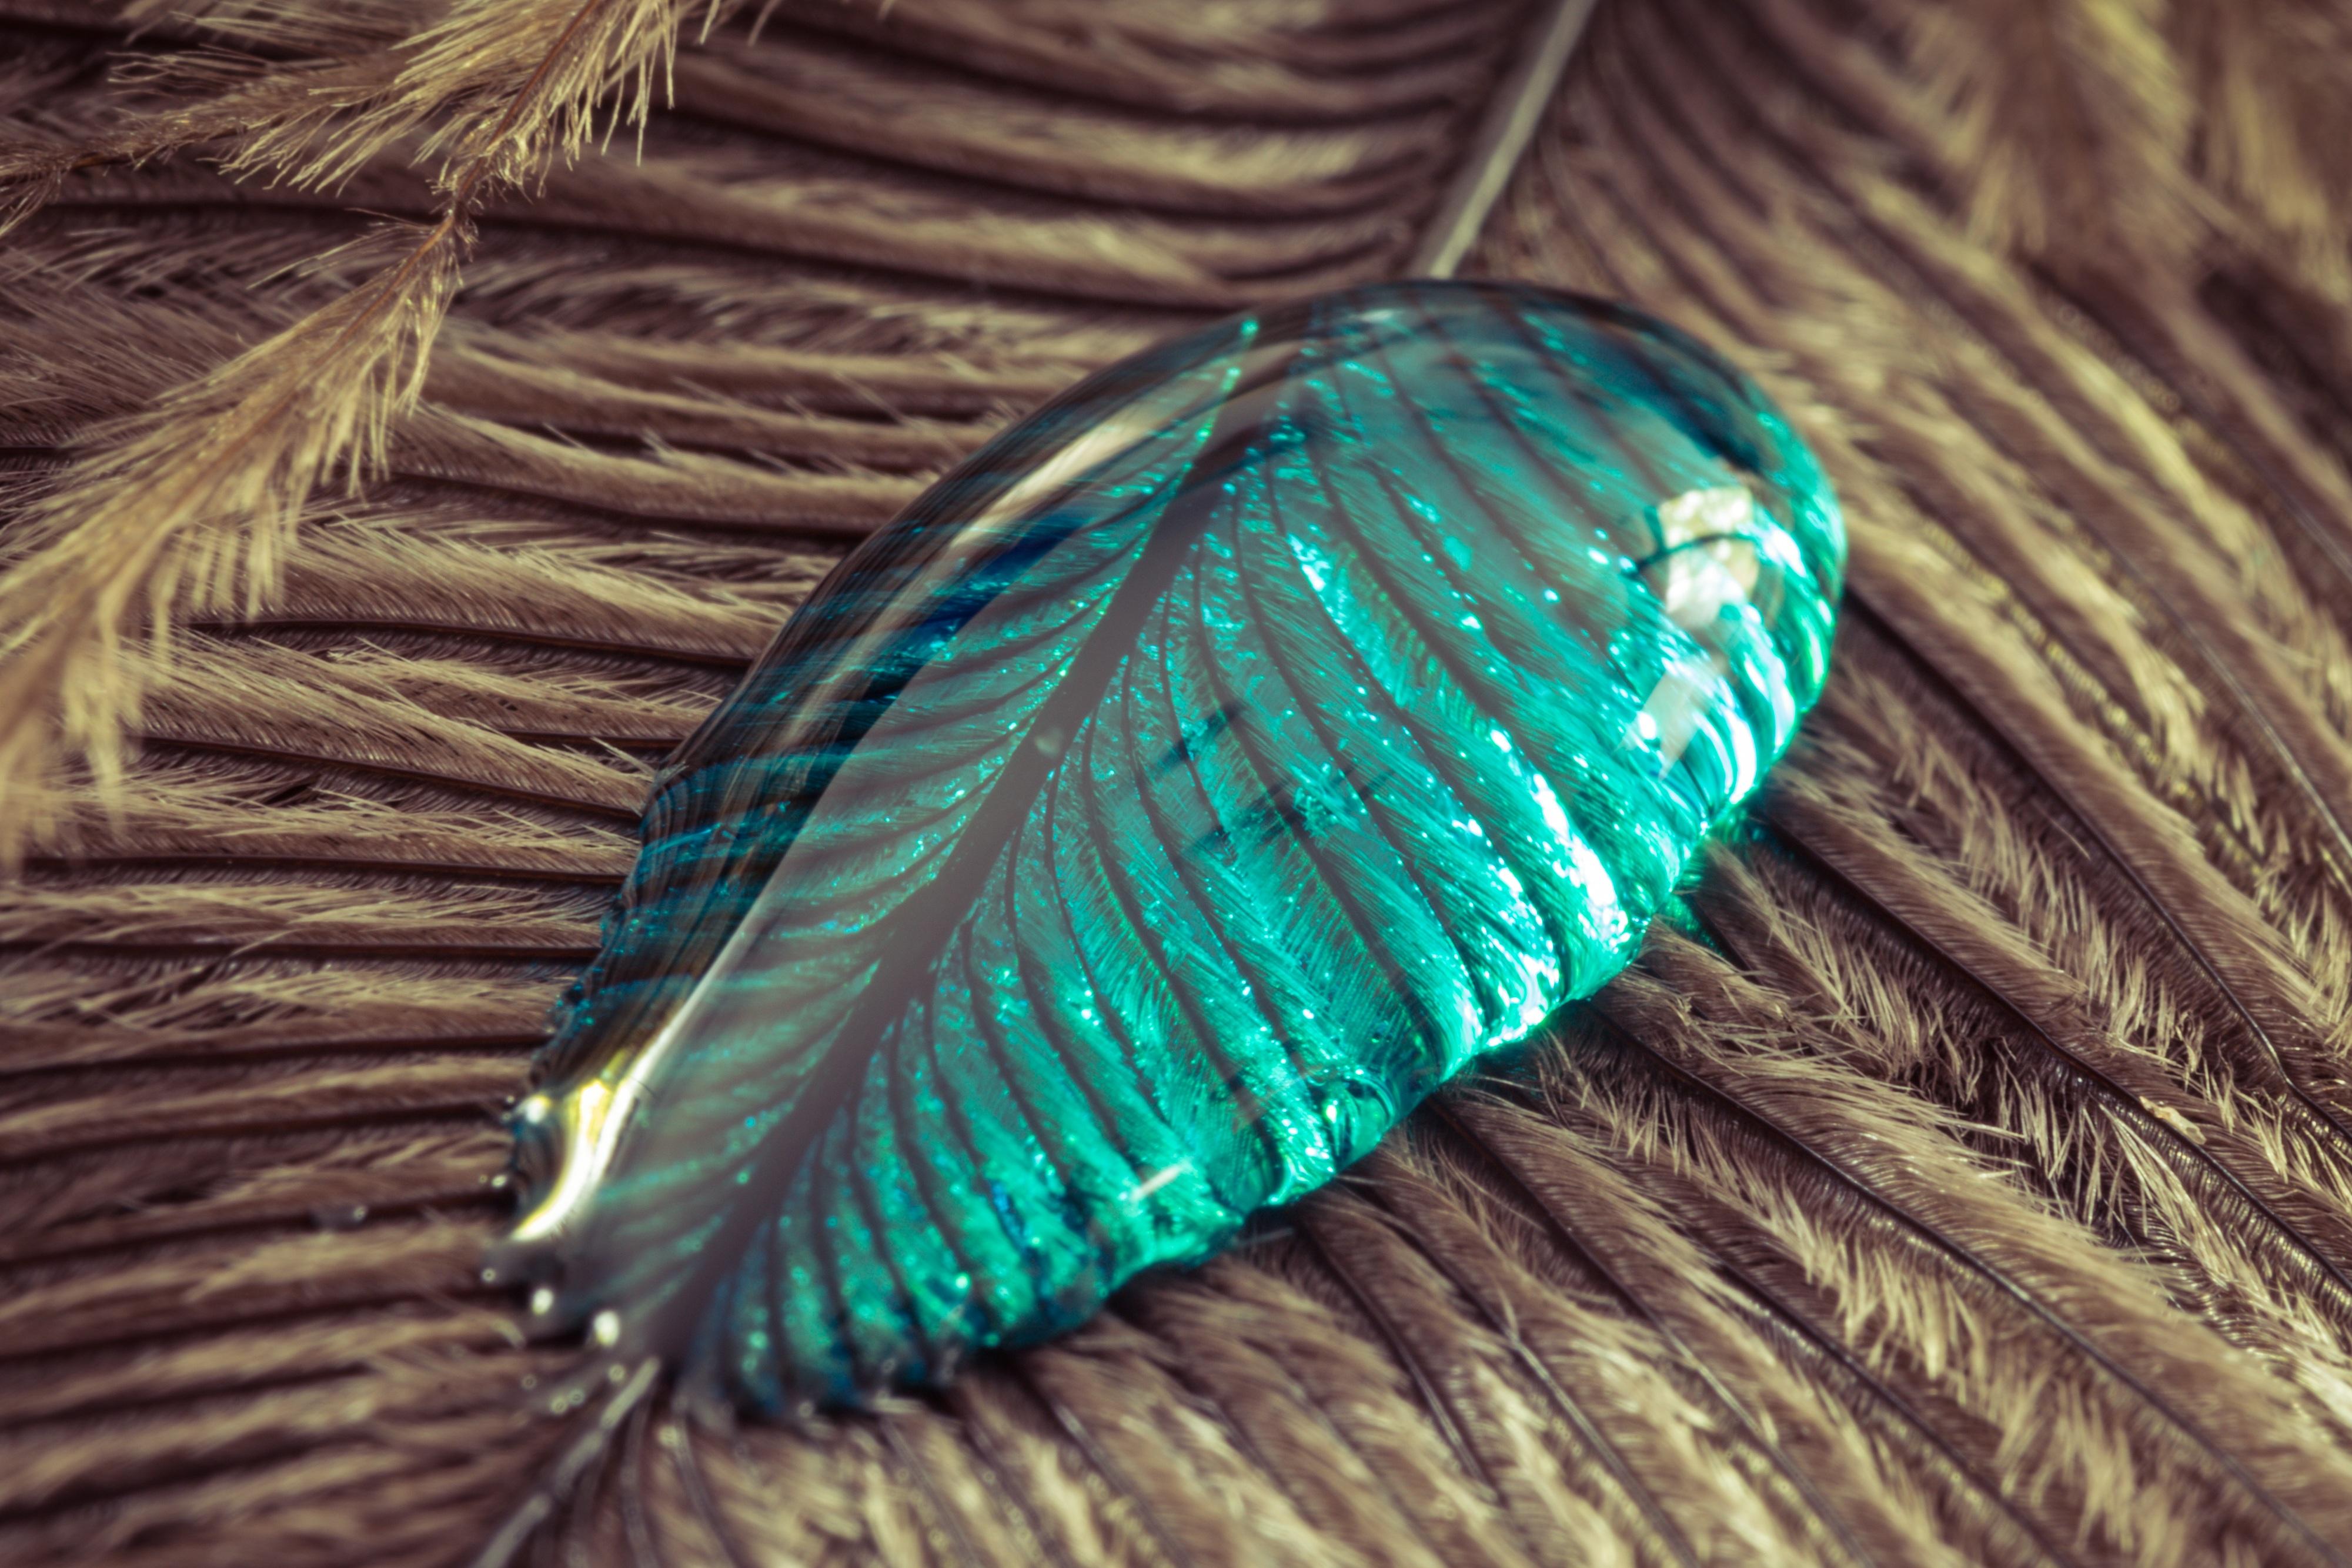 Fotos gratis : líquido, pájaro, ala, textura, hoja, primavera, verde ...